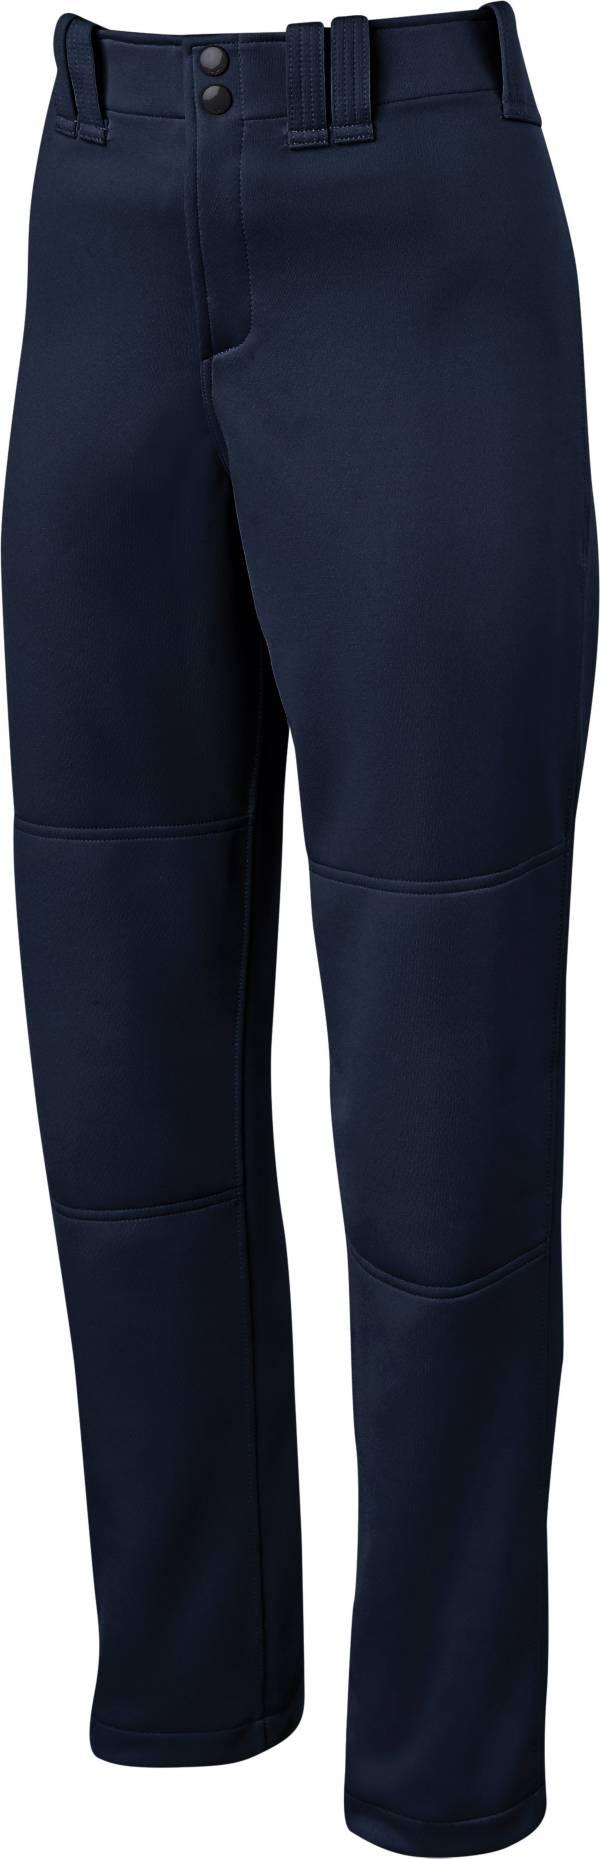 Mizuno Women's Full Length Softball Pants product image